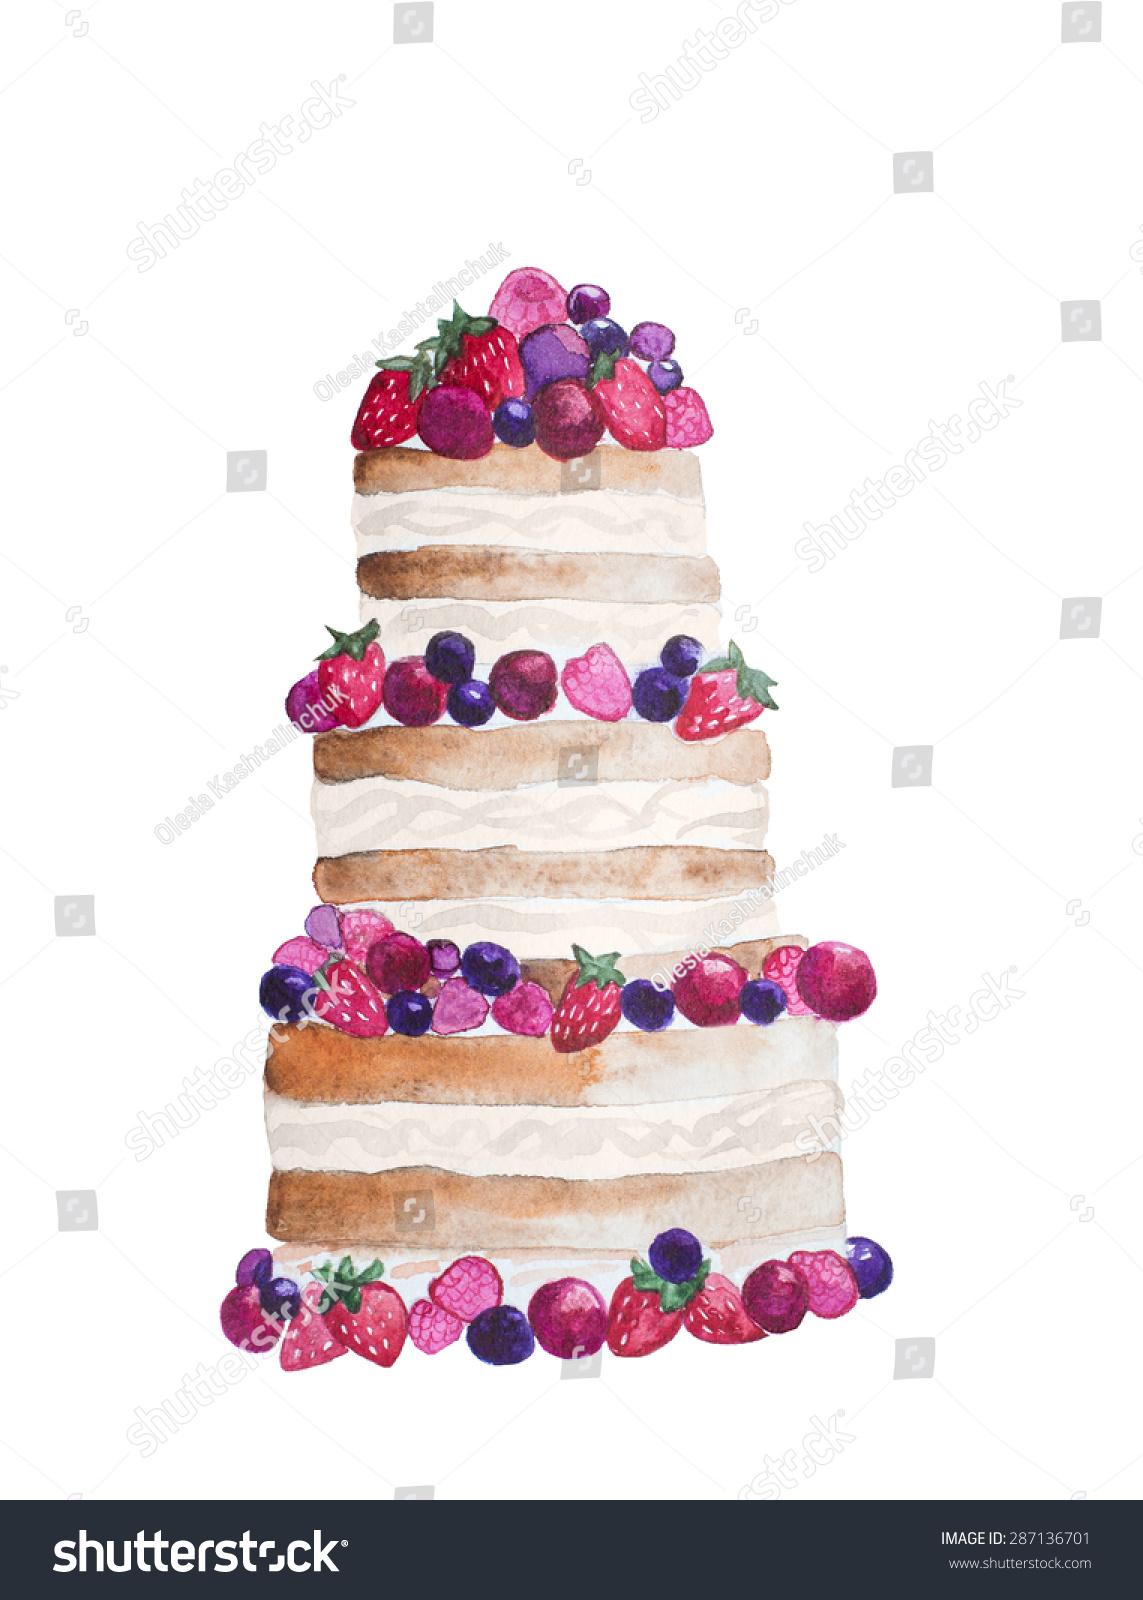 Shutterstock Strawberry Cakes